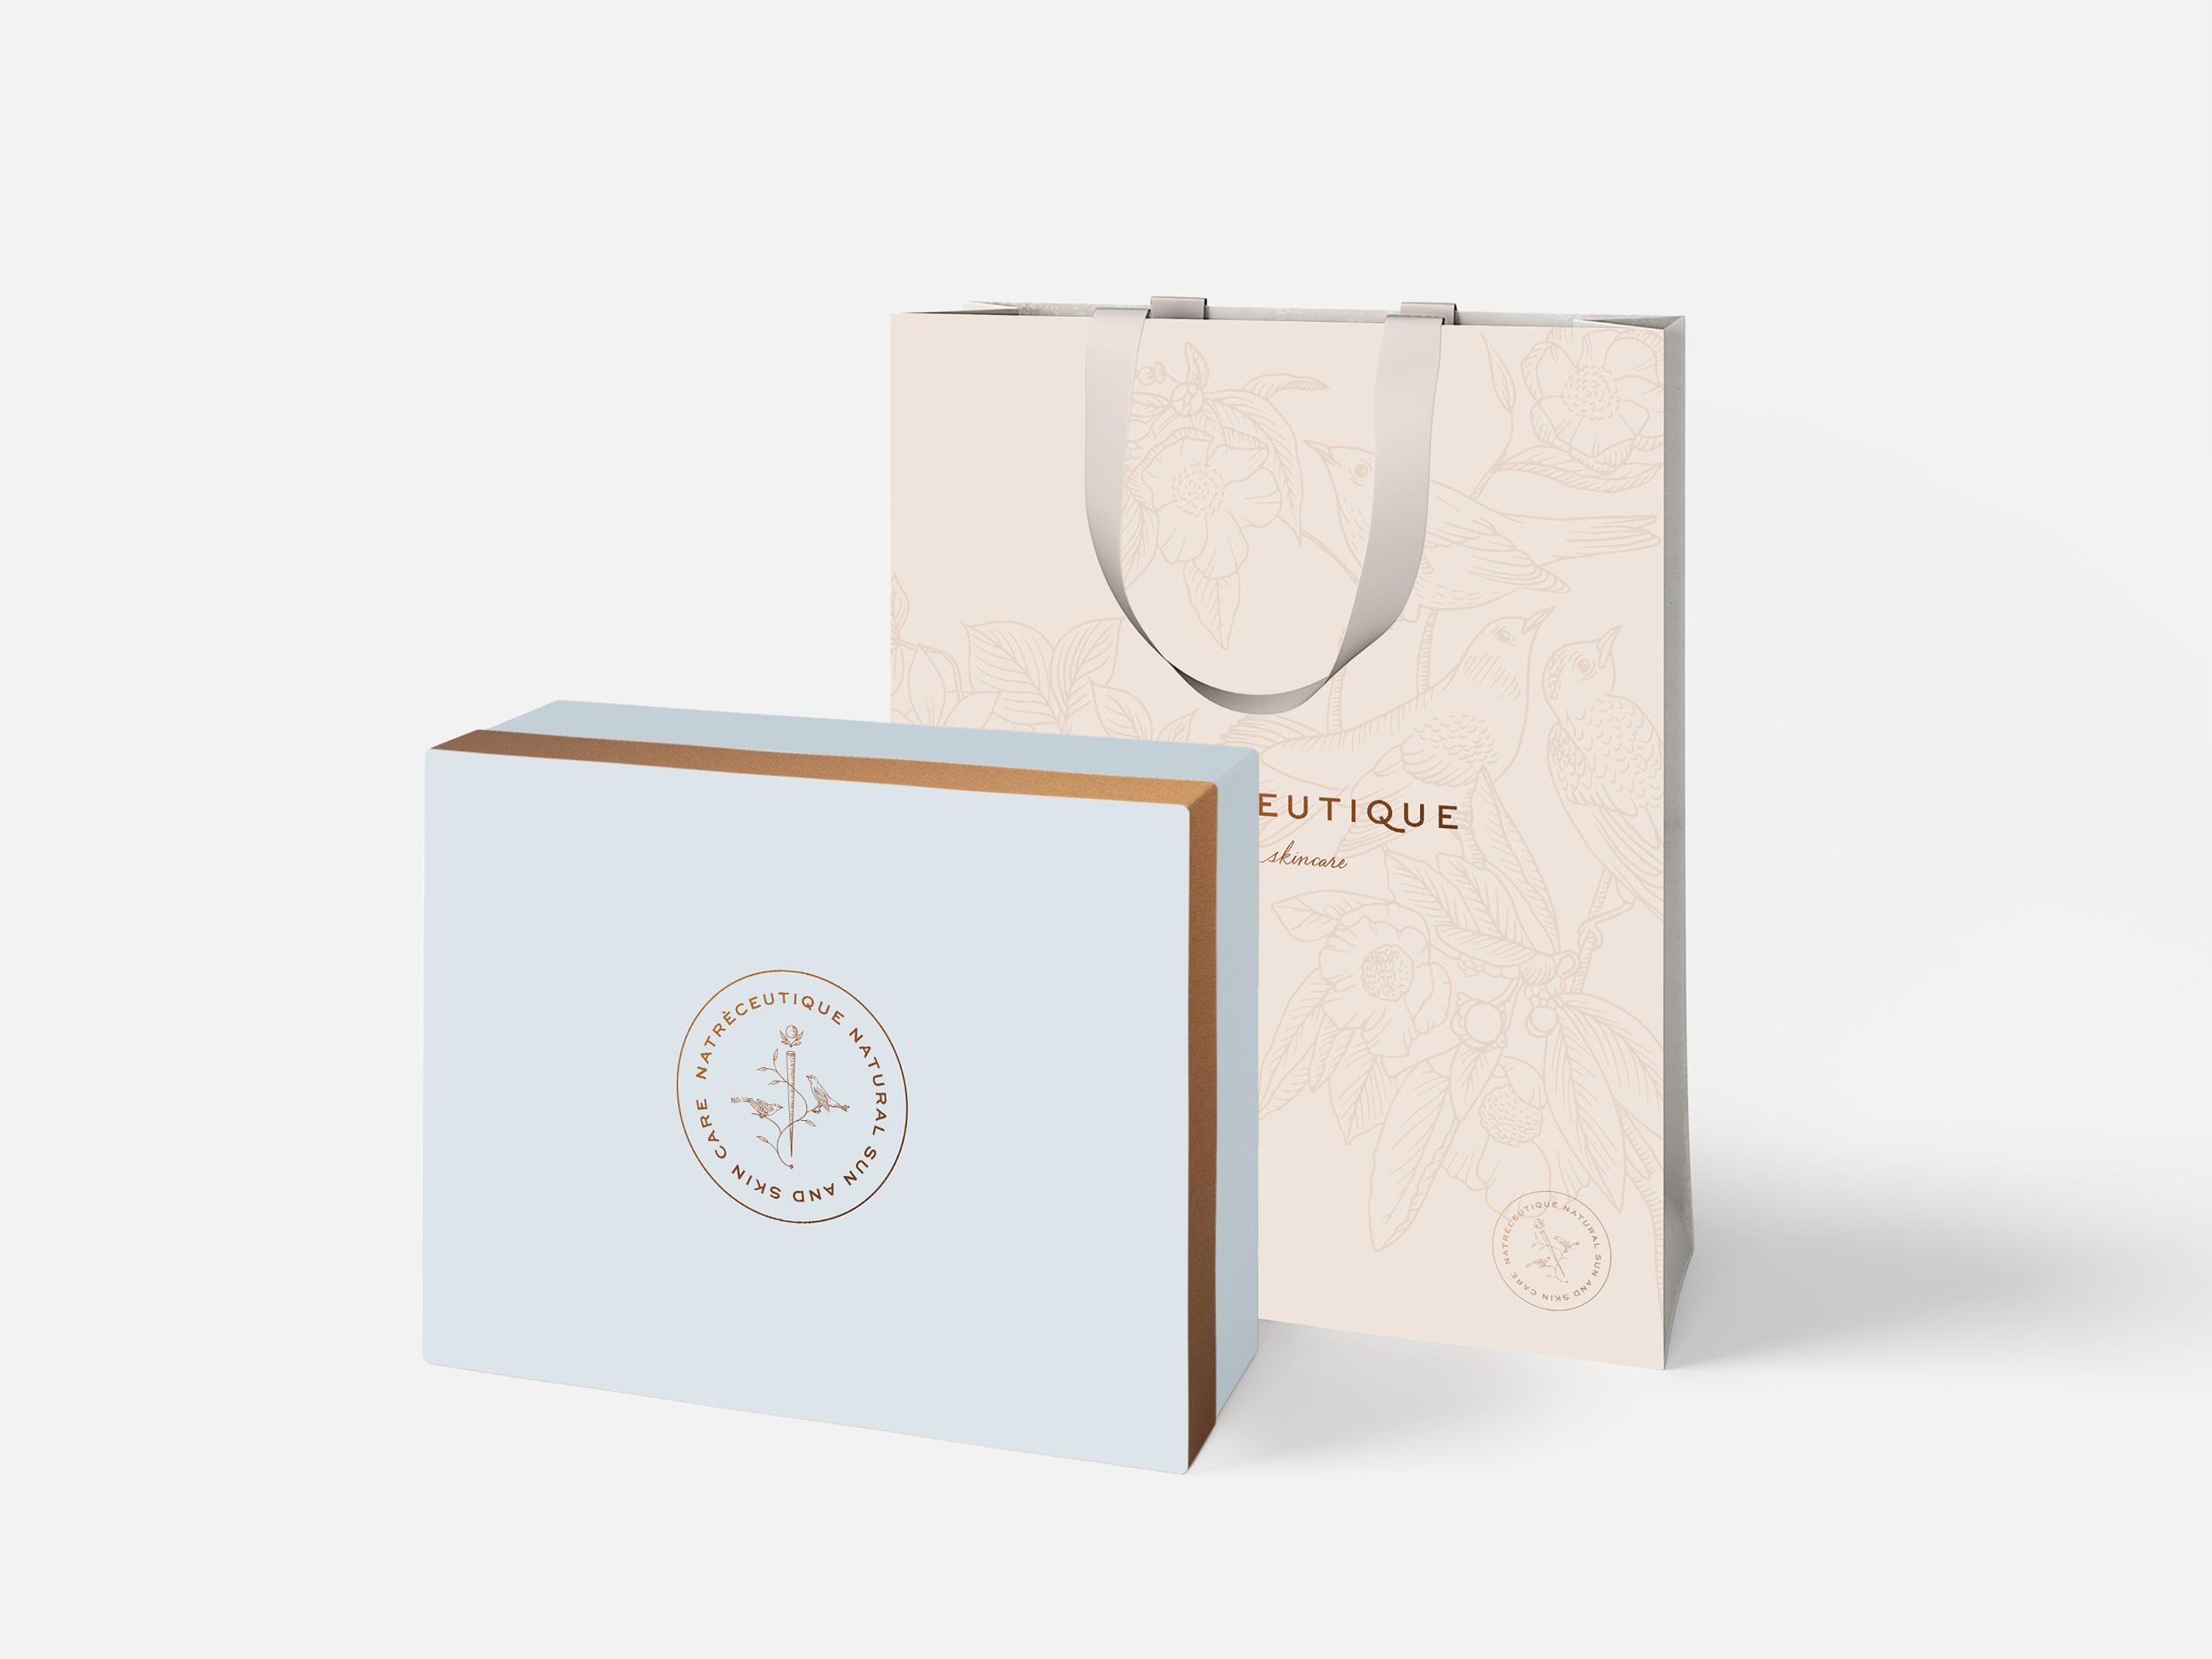 natreceutique-packaging-1.jpg